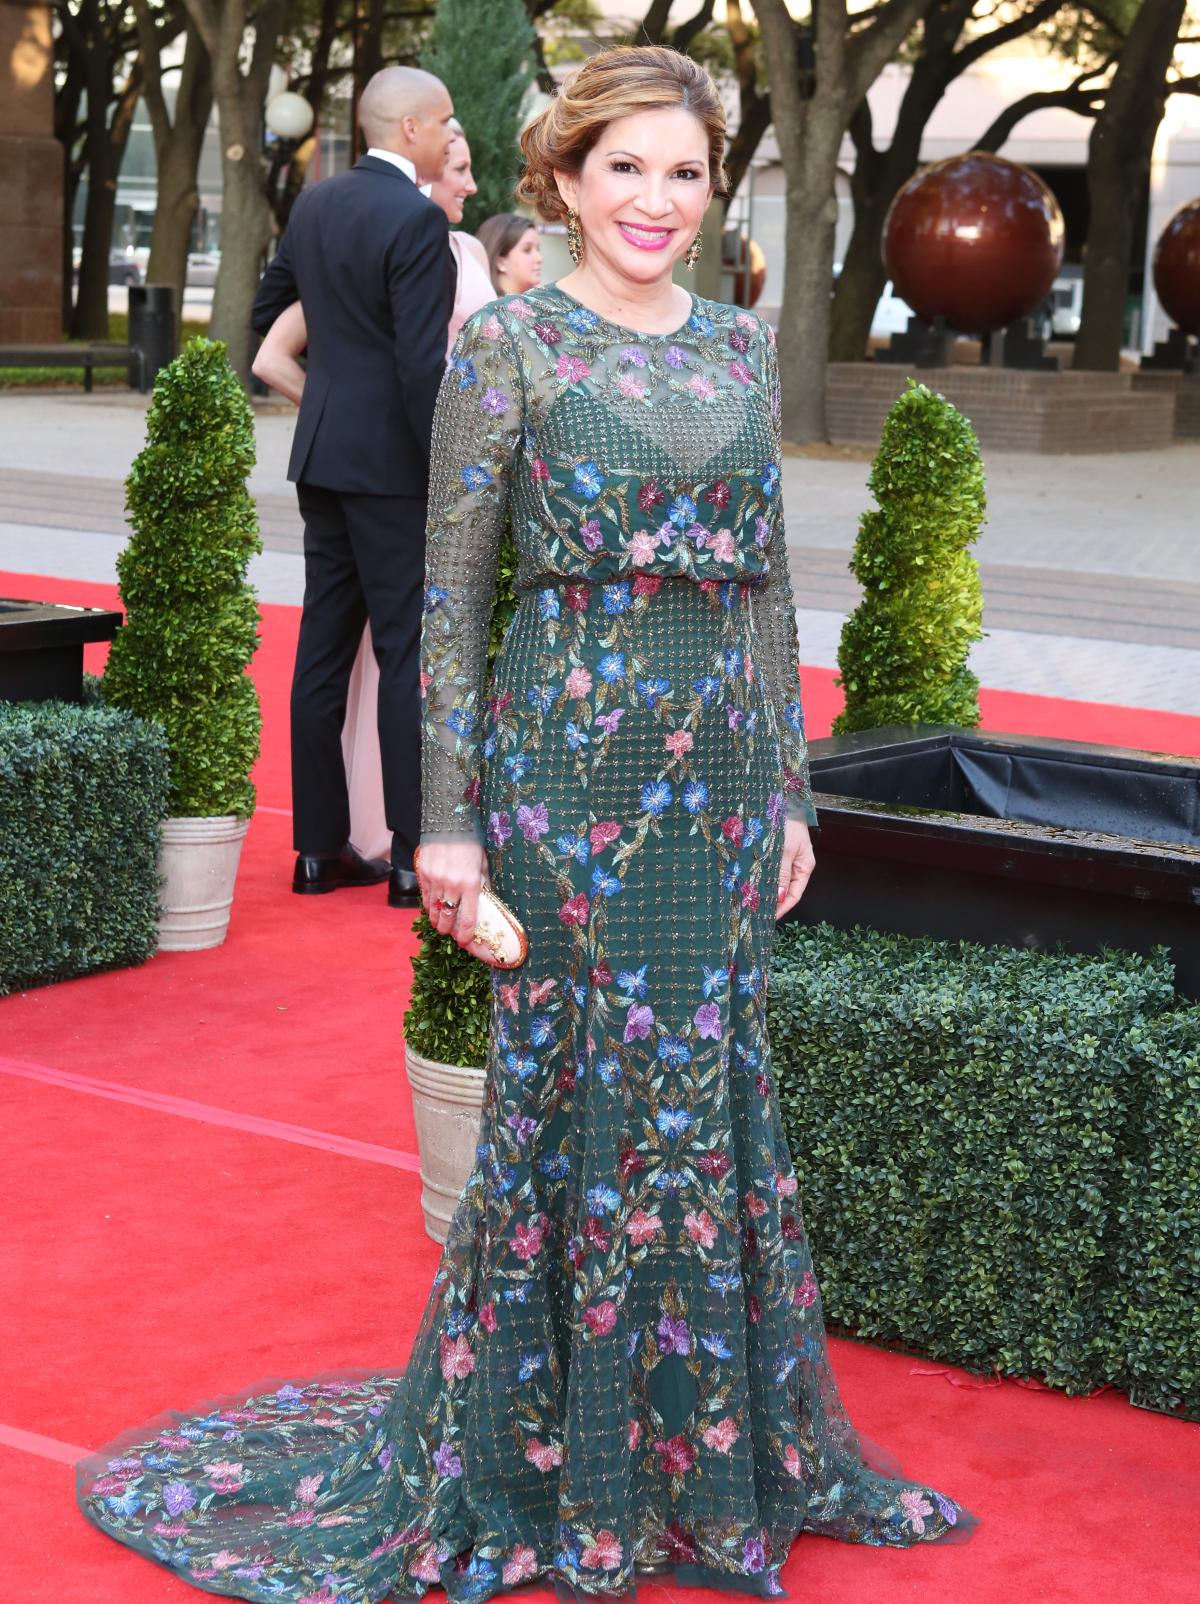 Houston, Opera Ball Gowns, April 2016,  Alex Blair in Monique Lhuillier